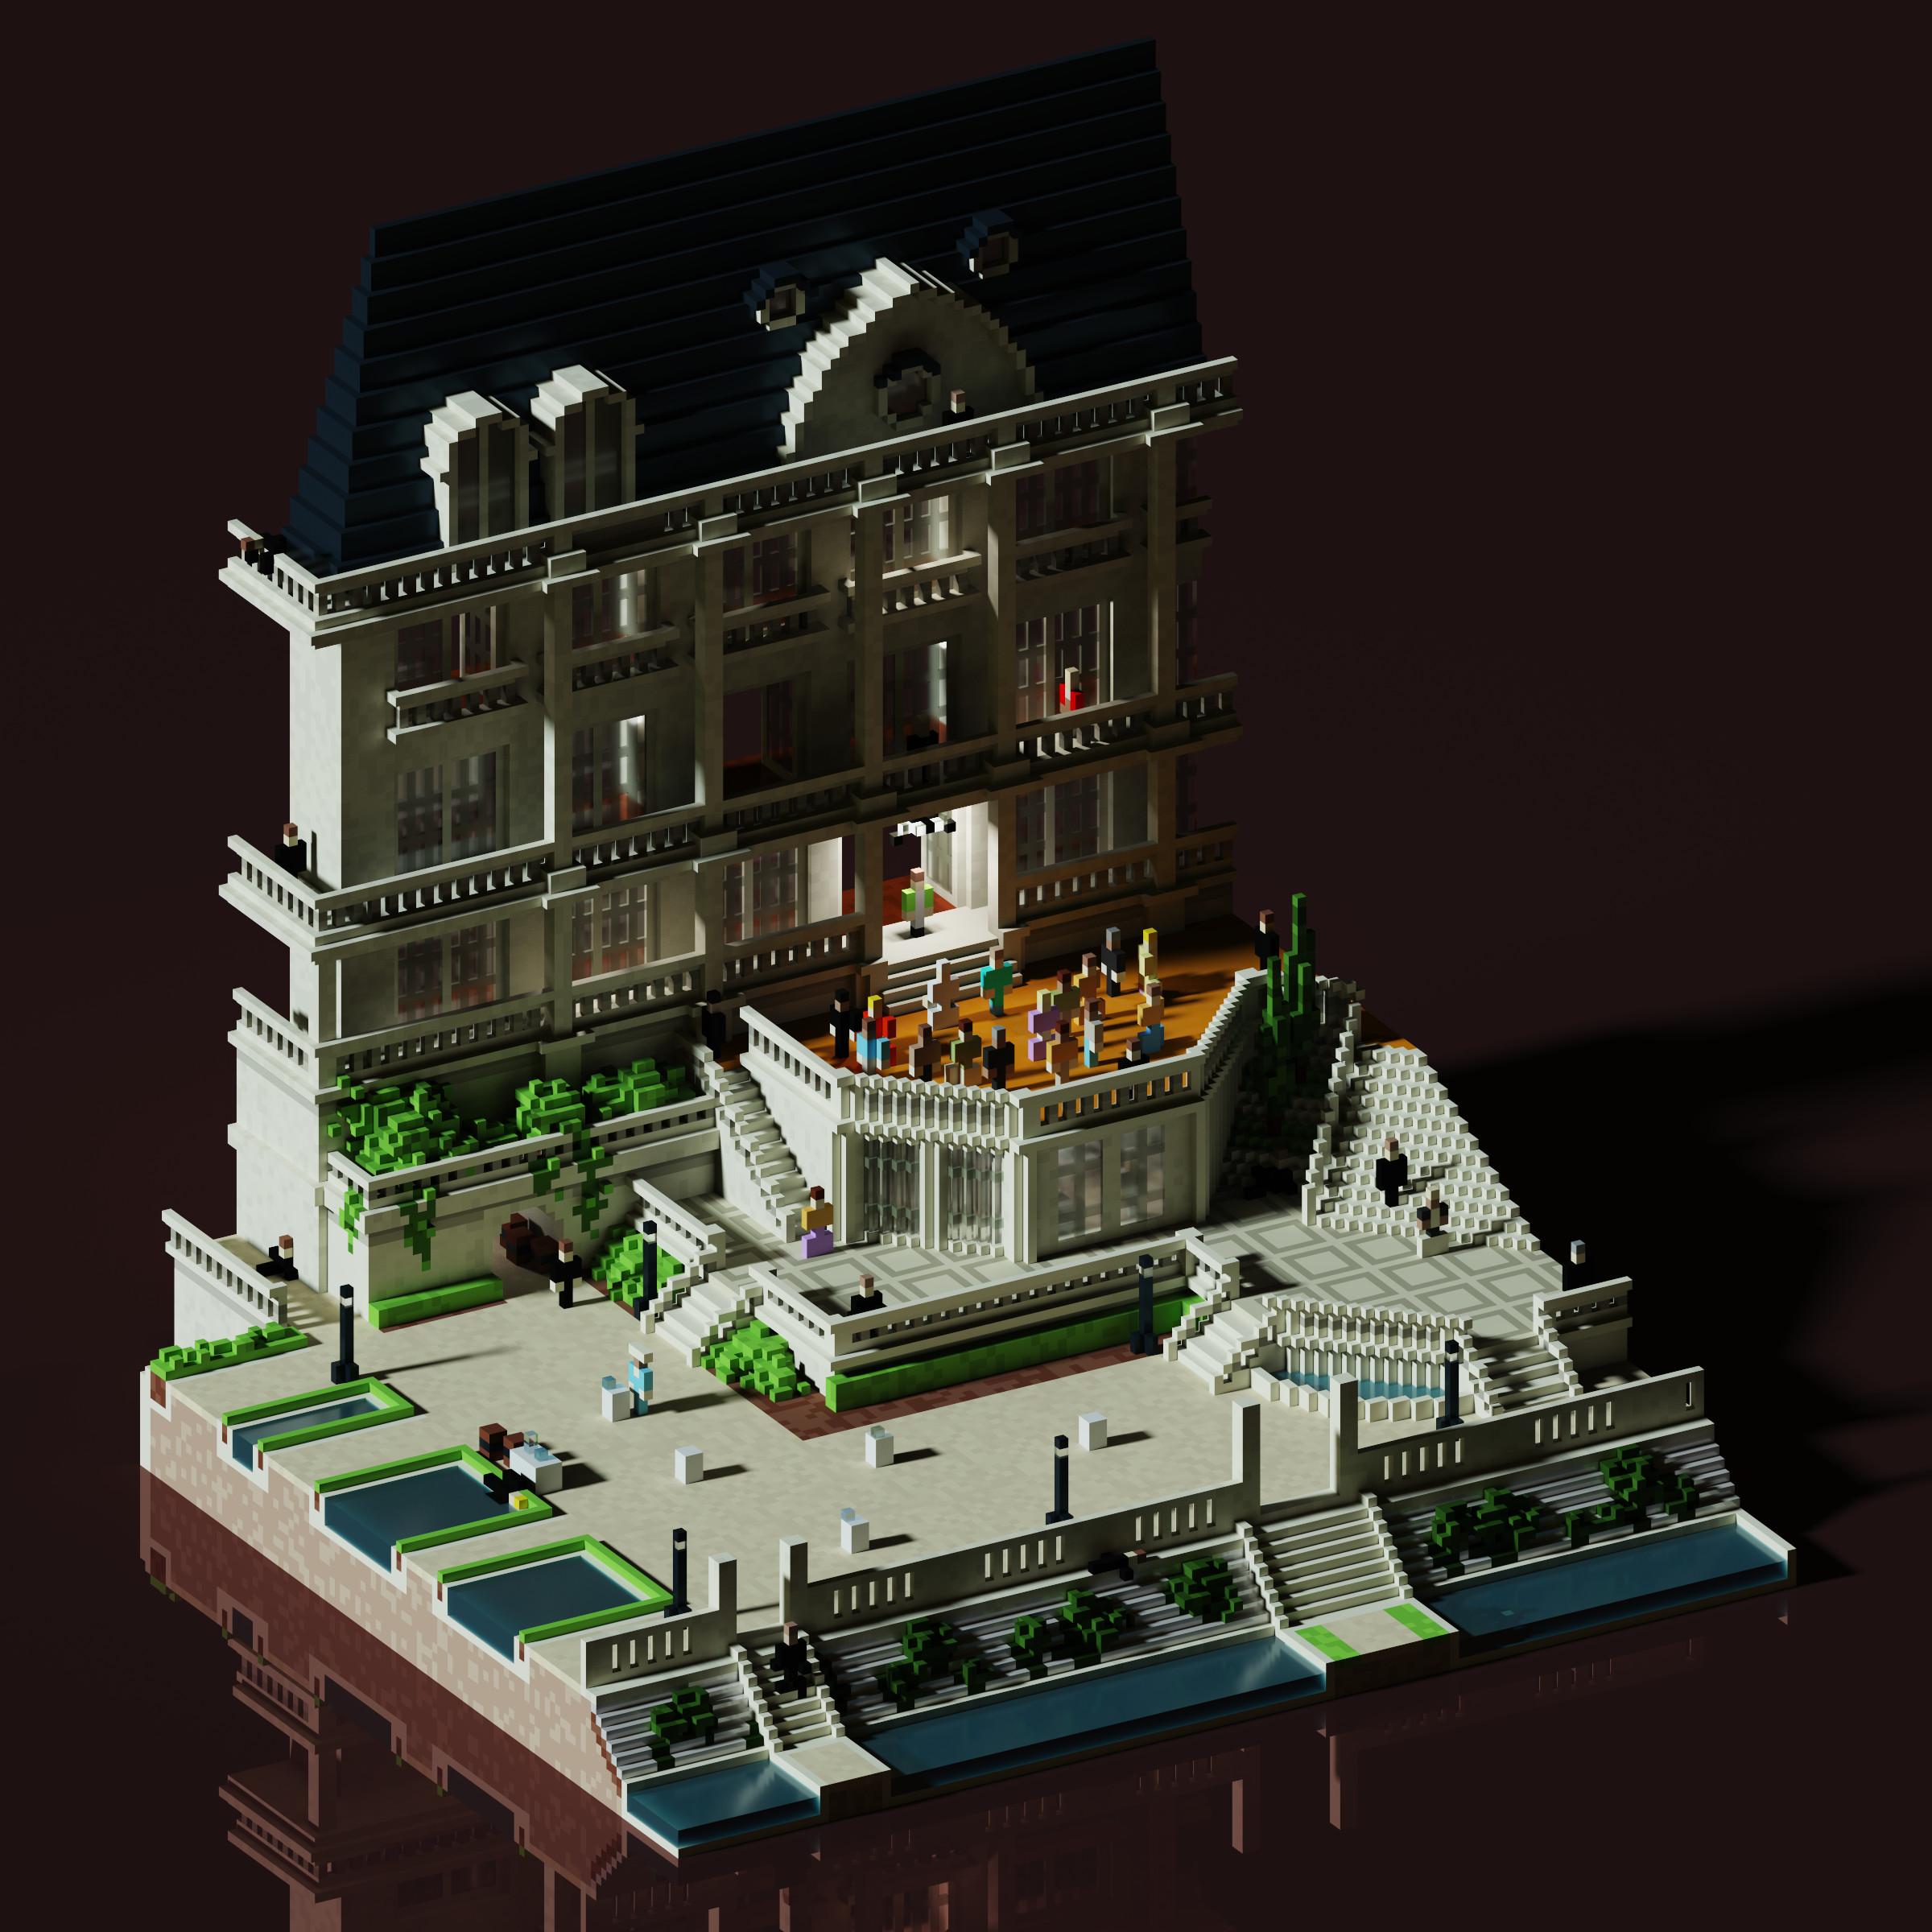 The Last Yardbird MagicaVoxel render - May 2020